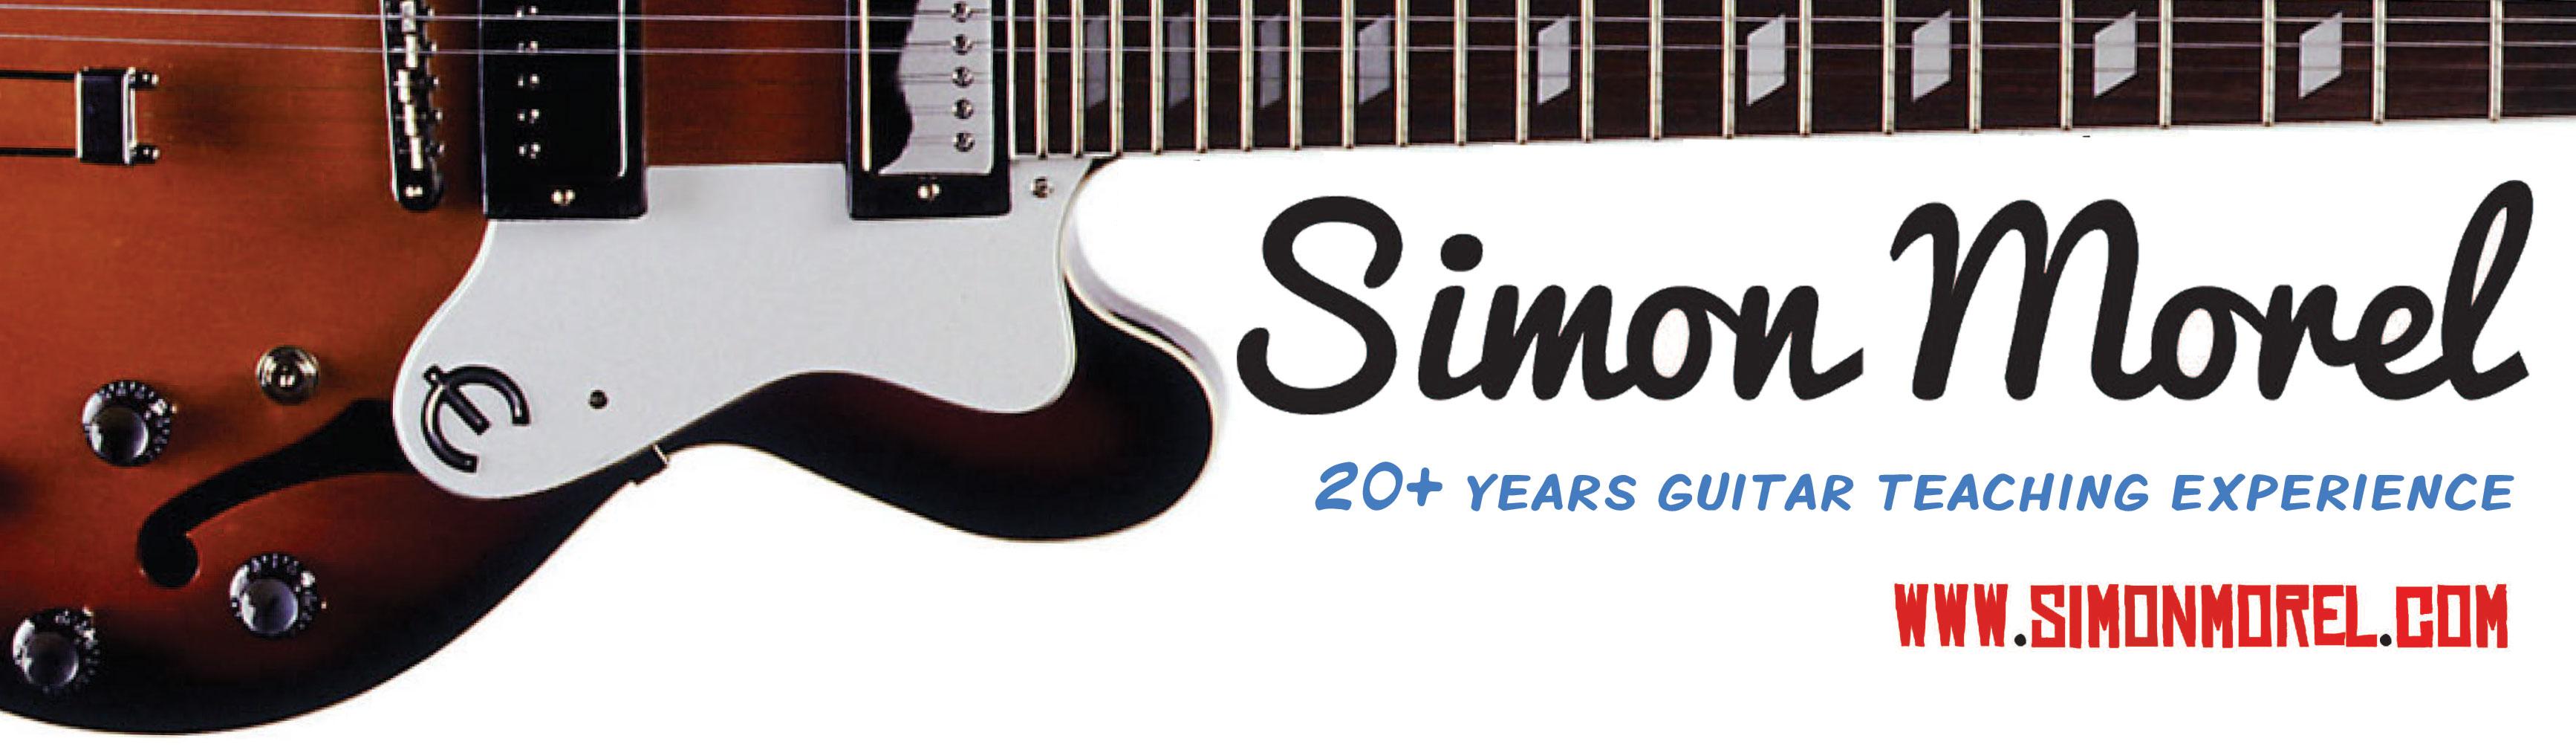 Simon Morel Guitar Lessons